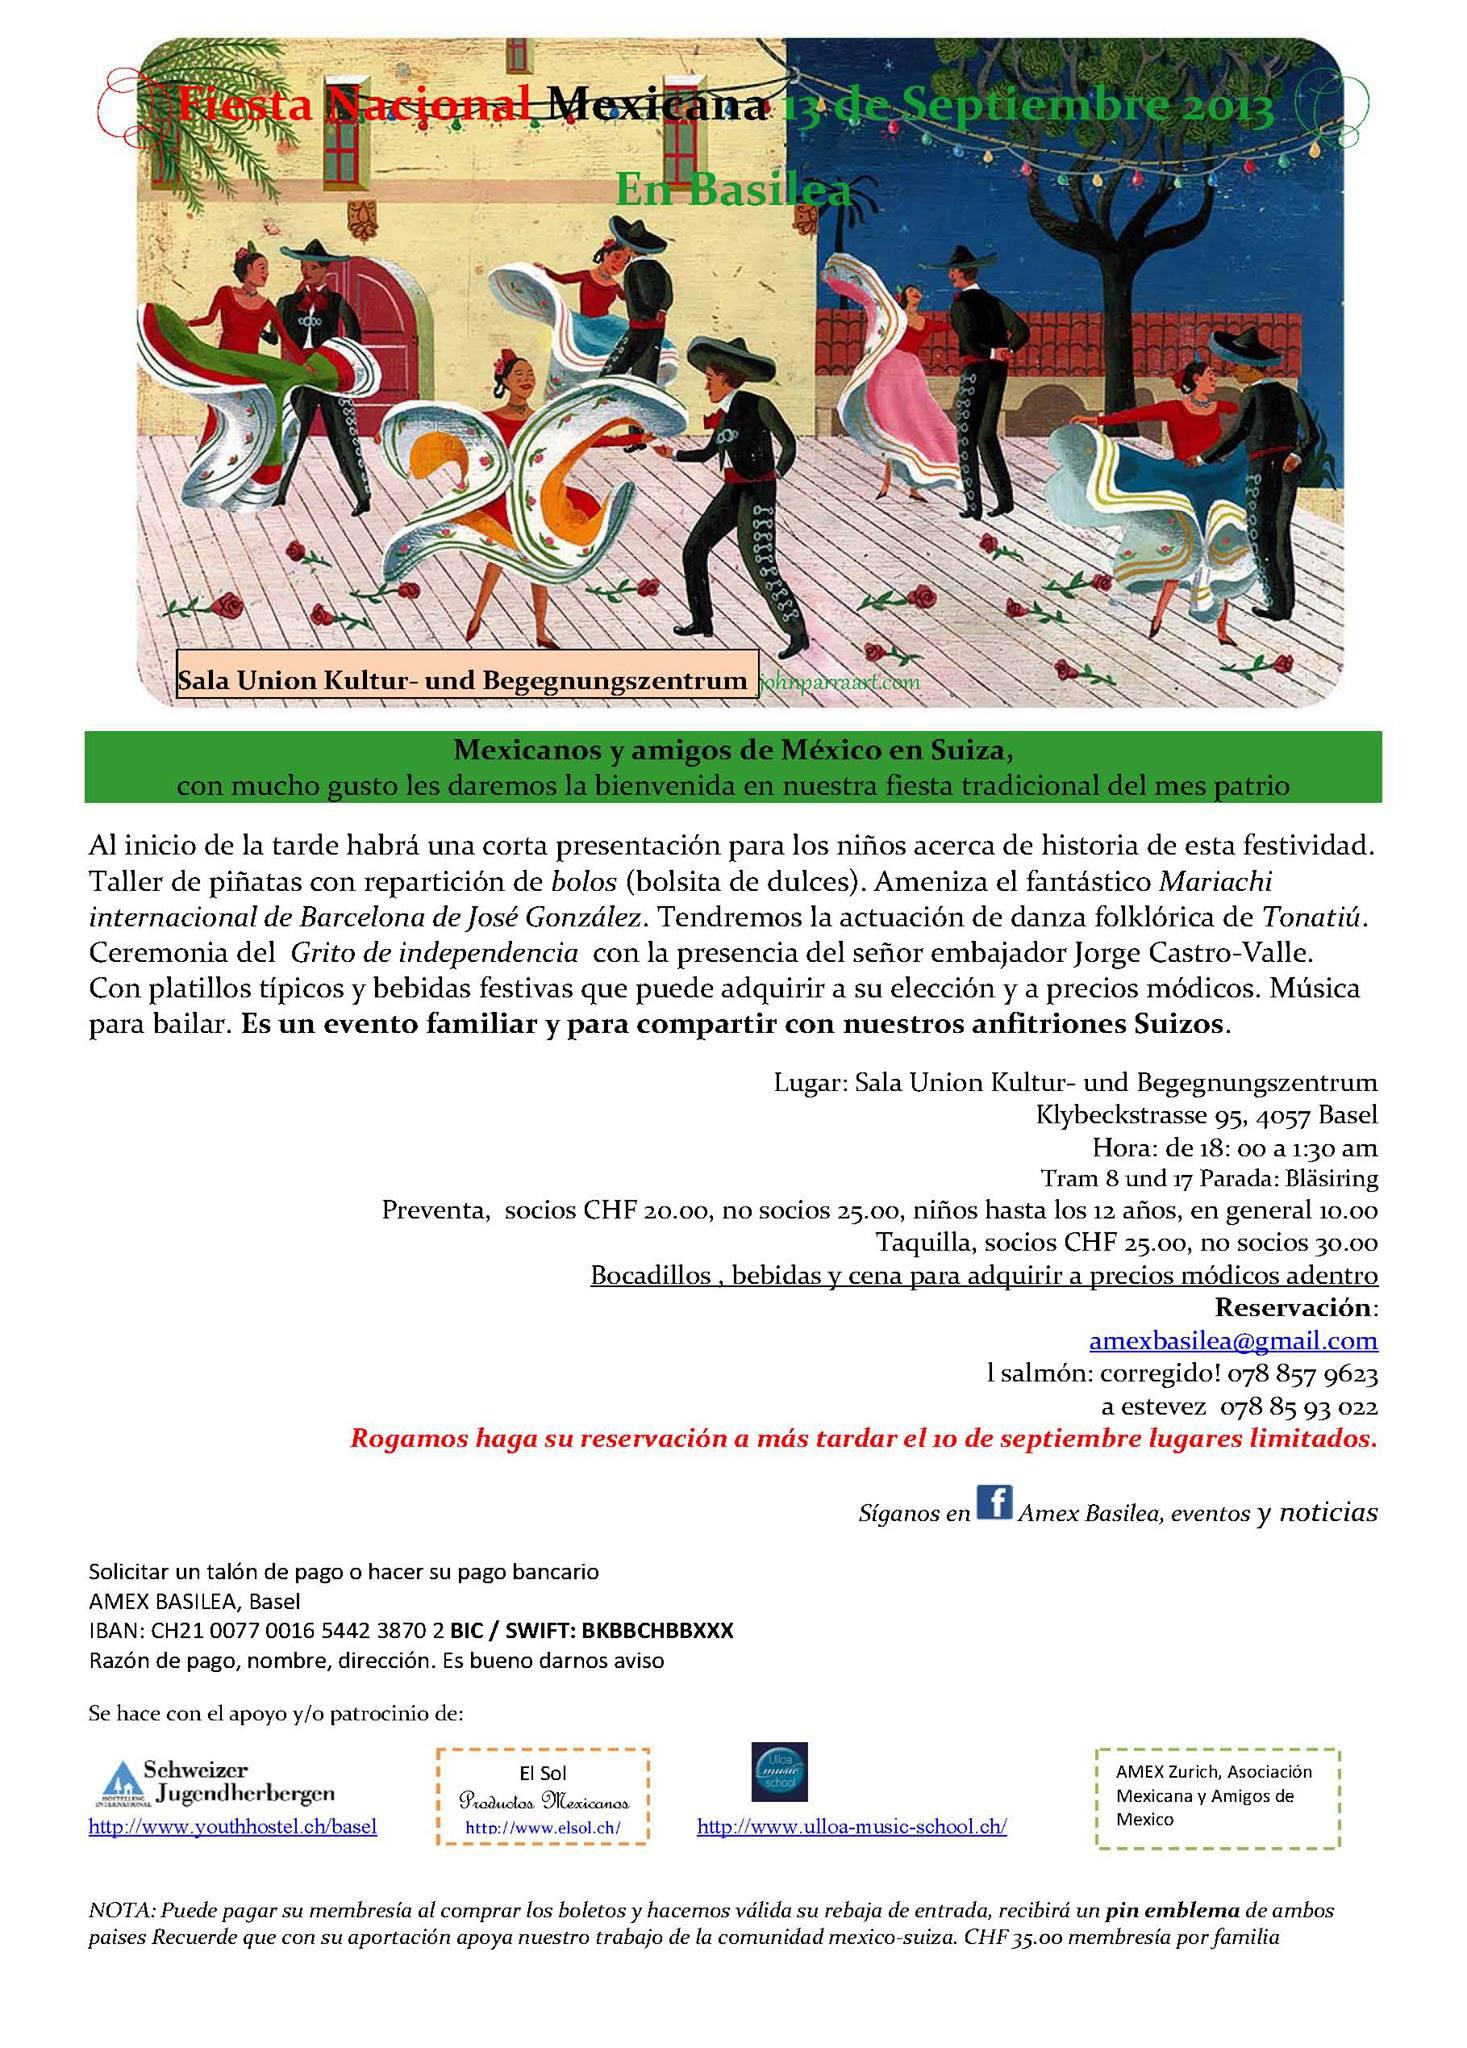 Fiesta Mexicana AMEX Basilea 2013